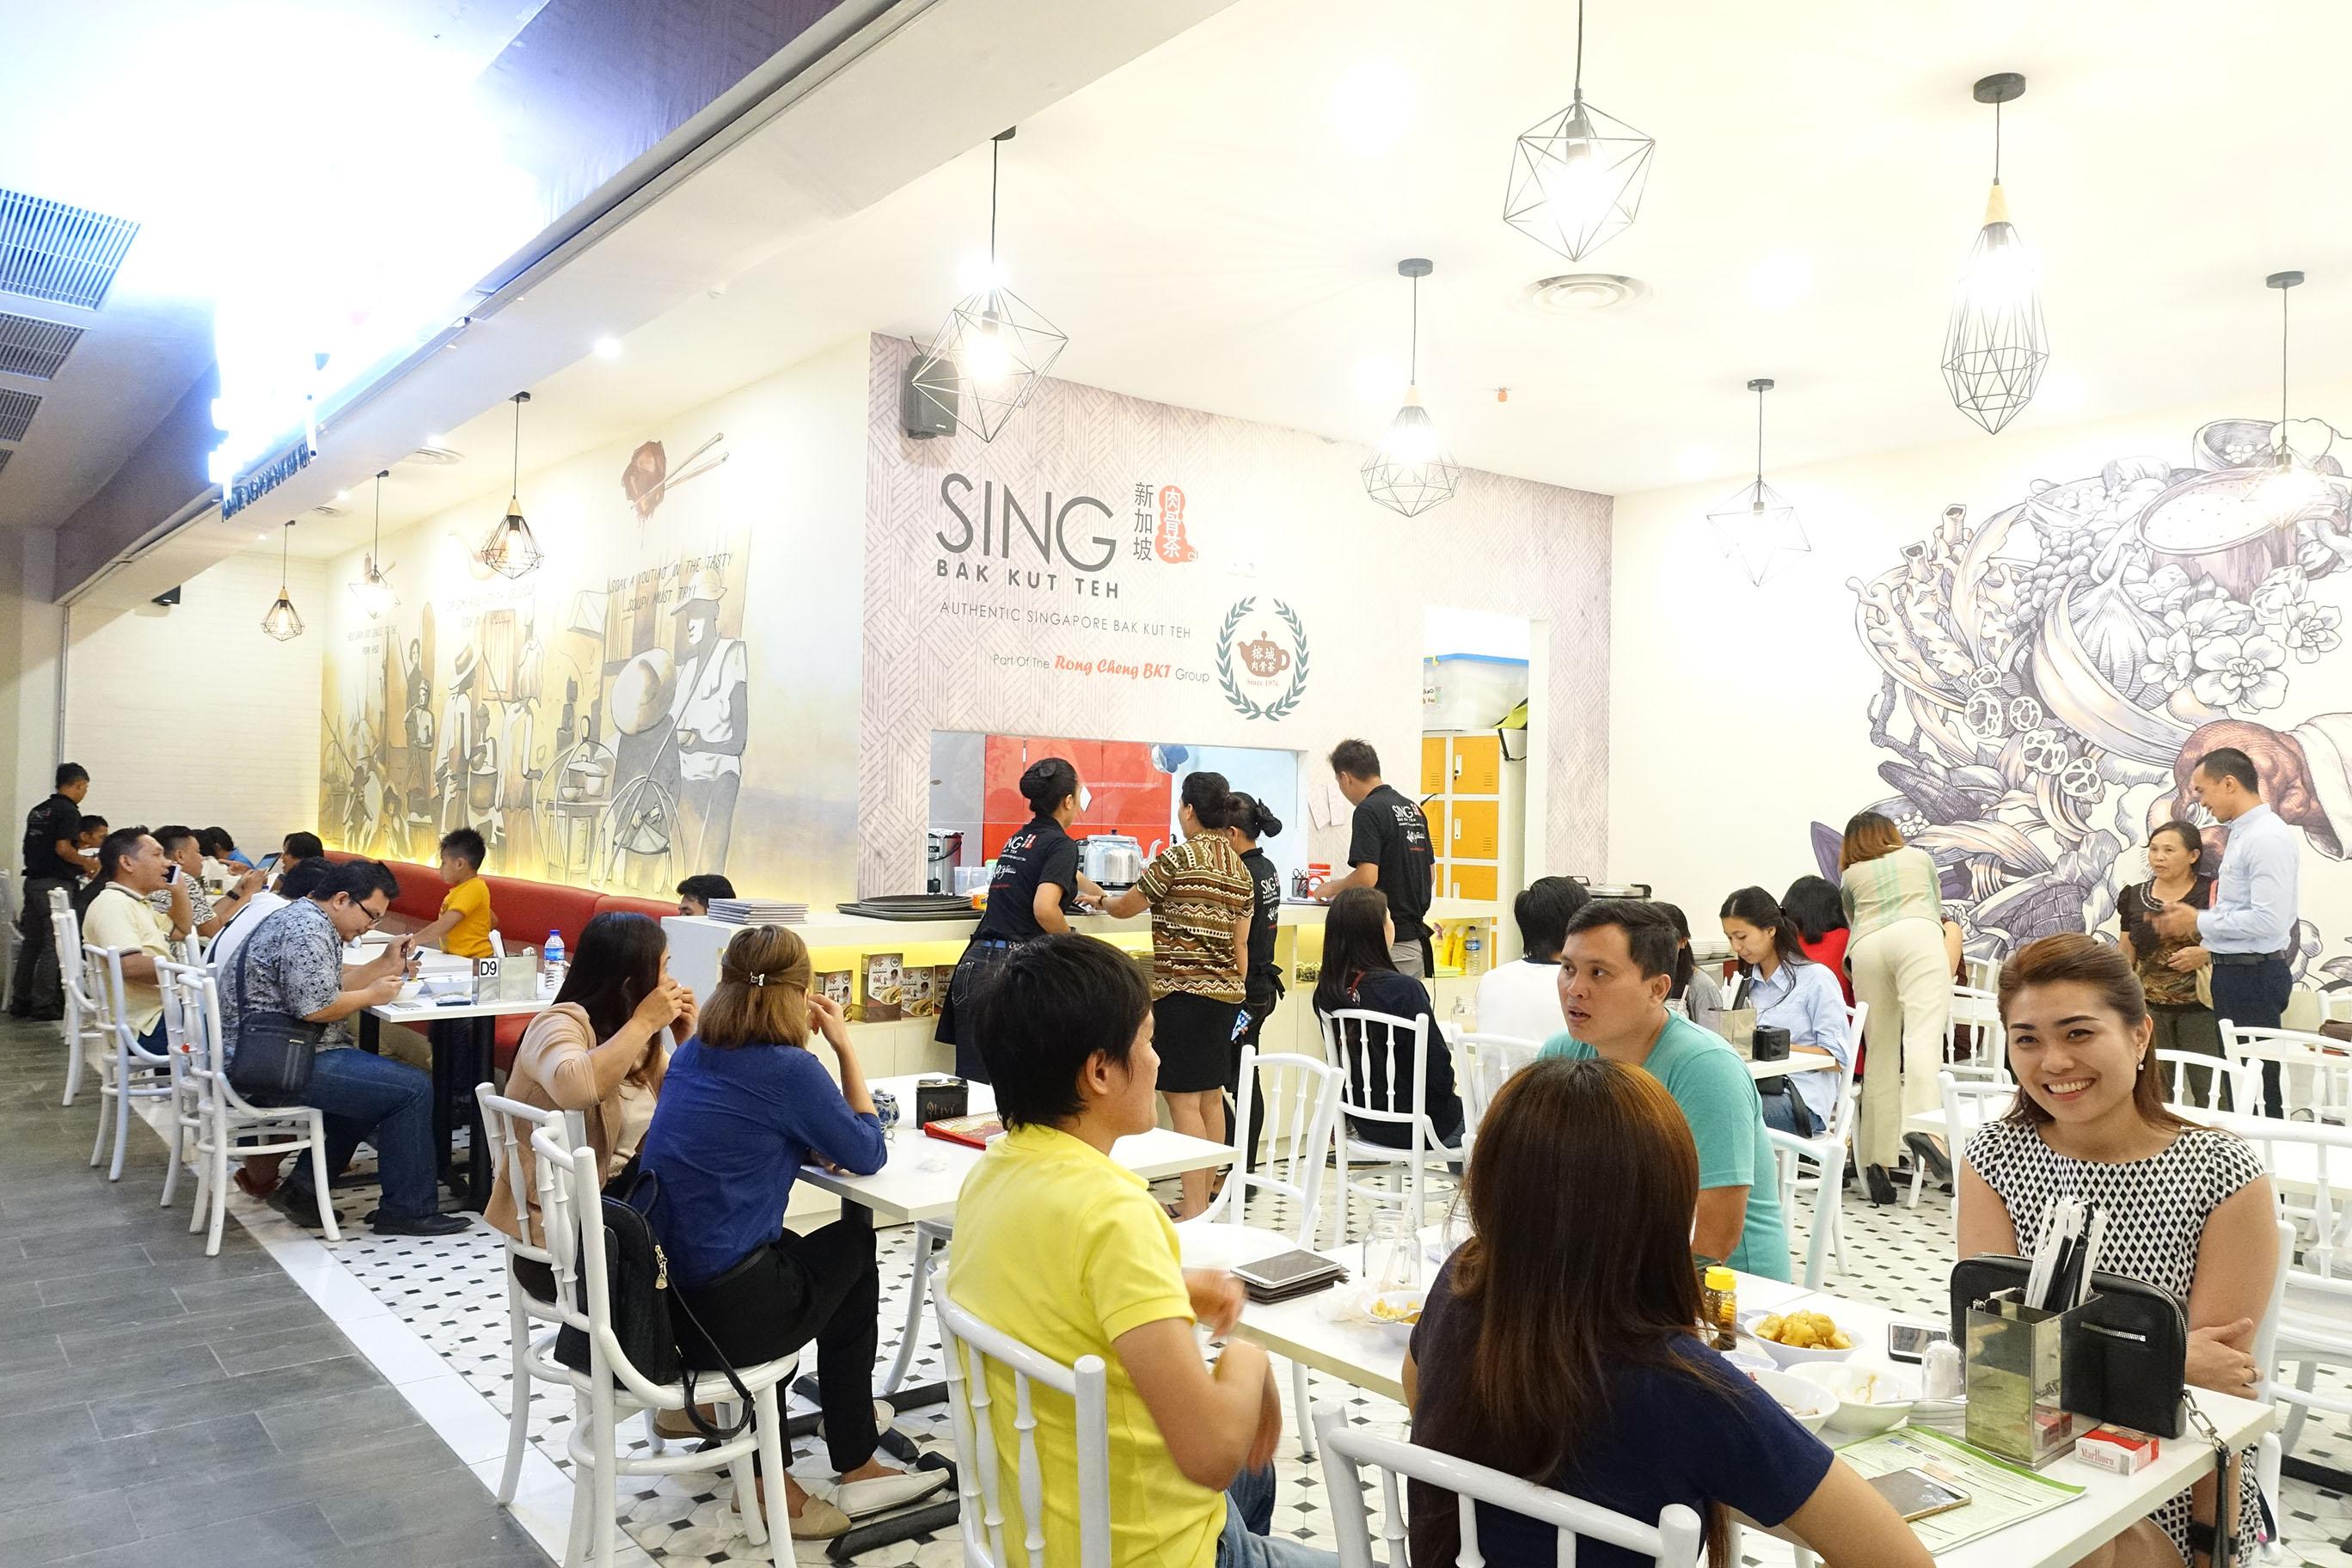 SING Bak Kut Teh Indonesia